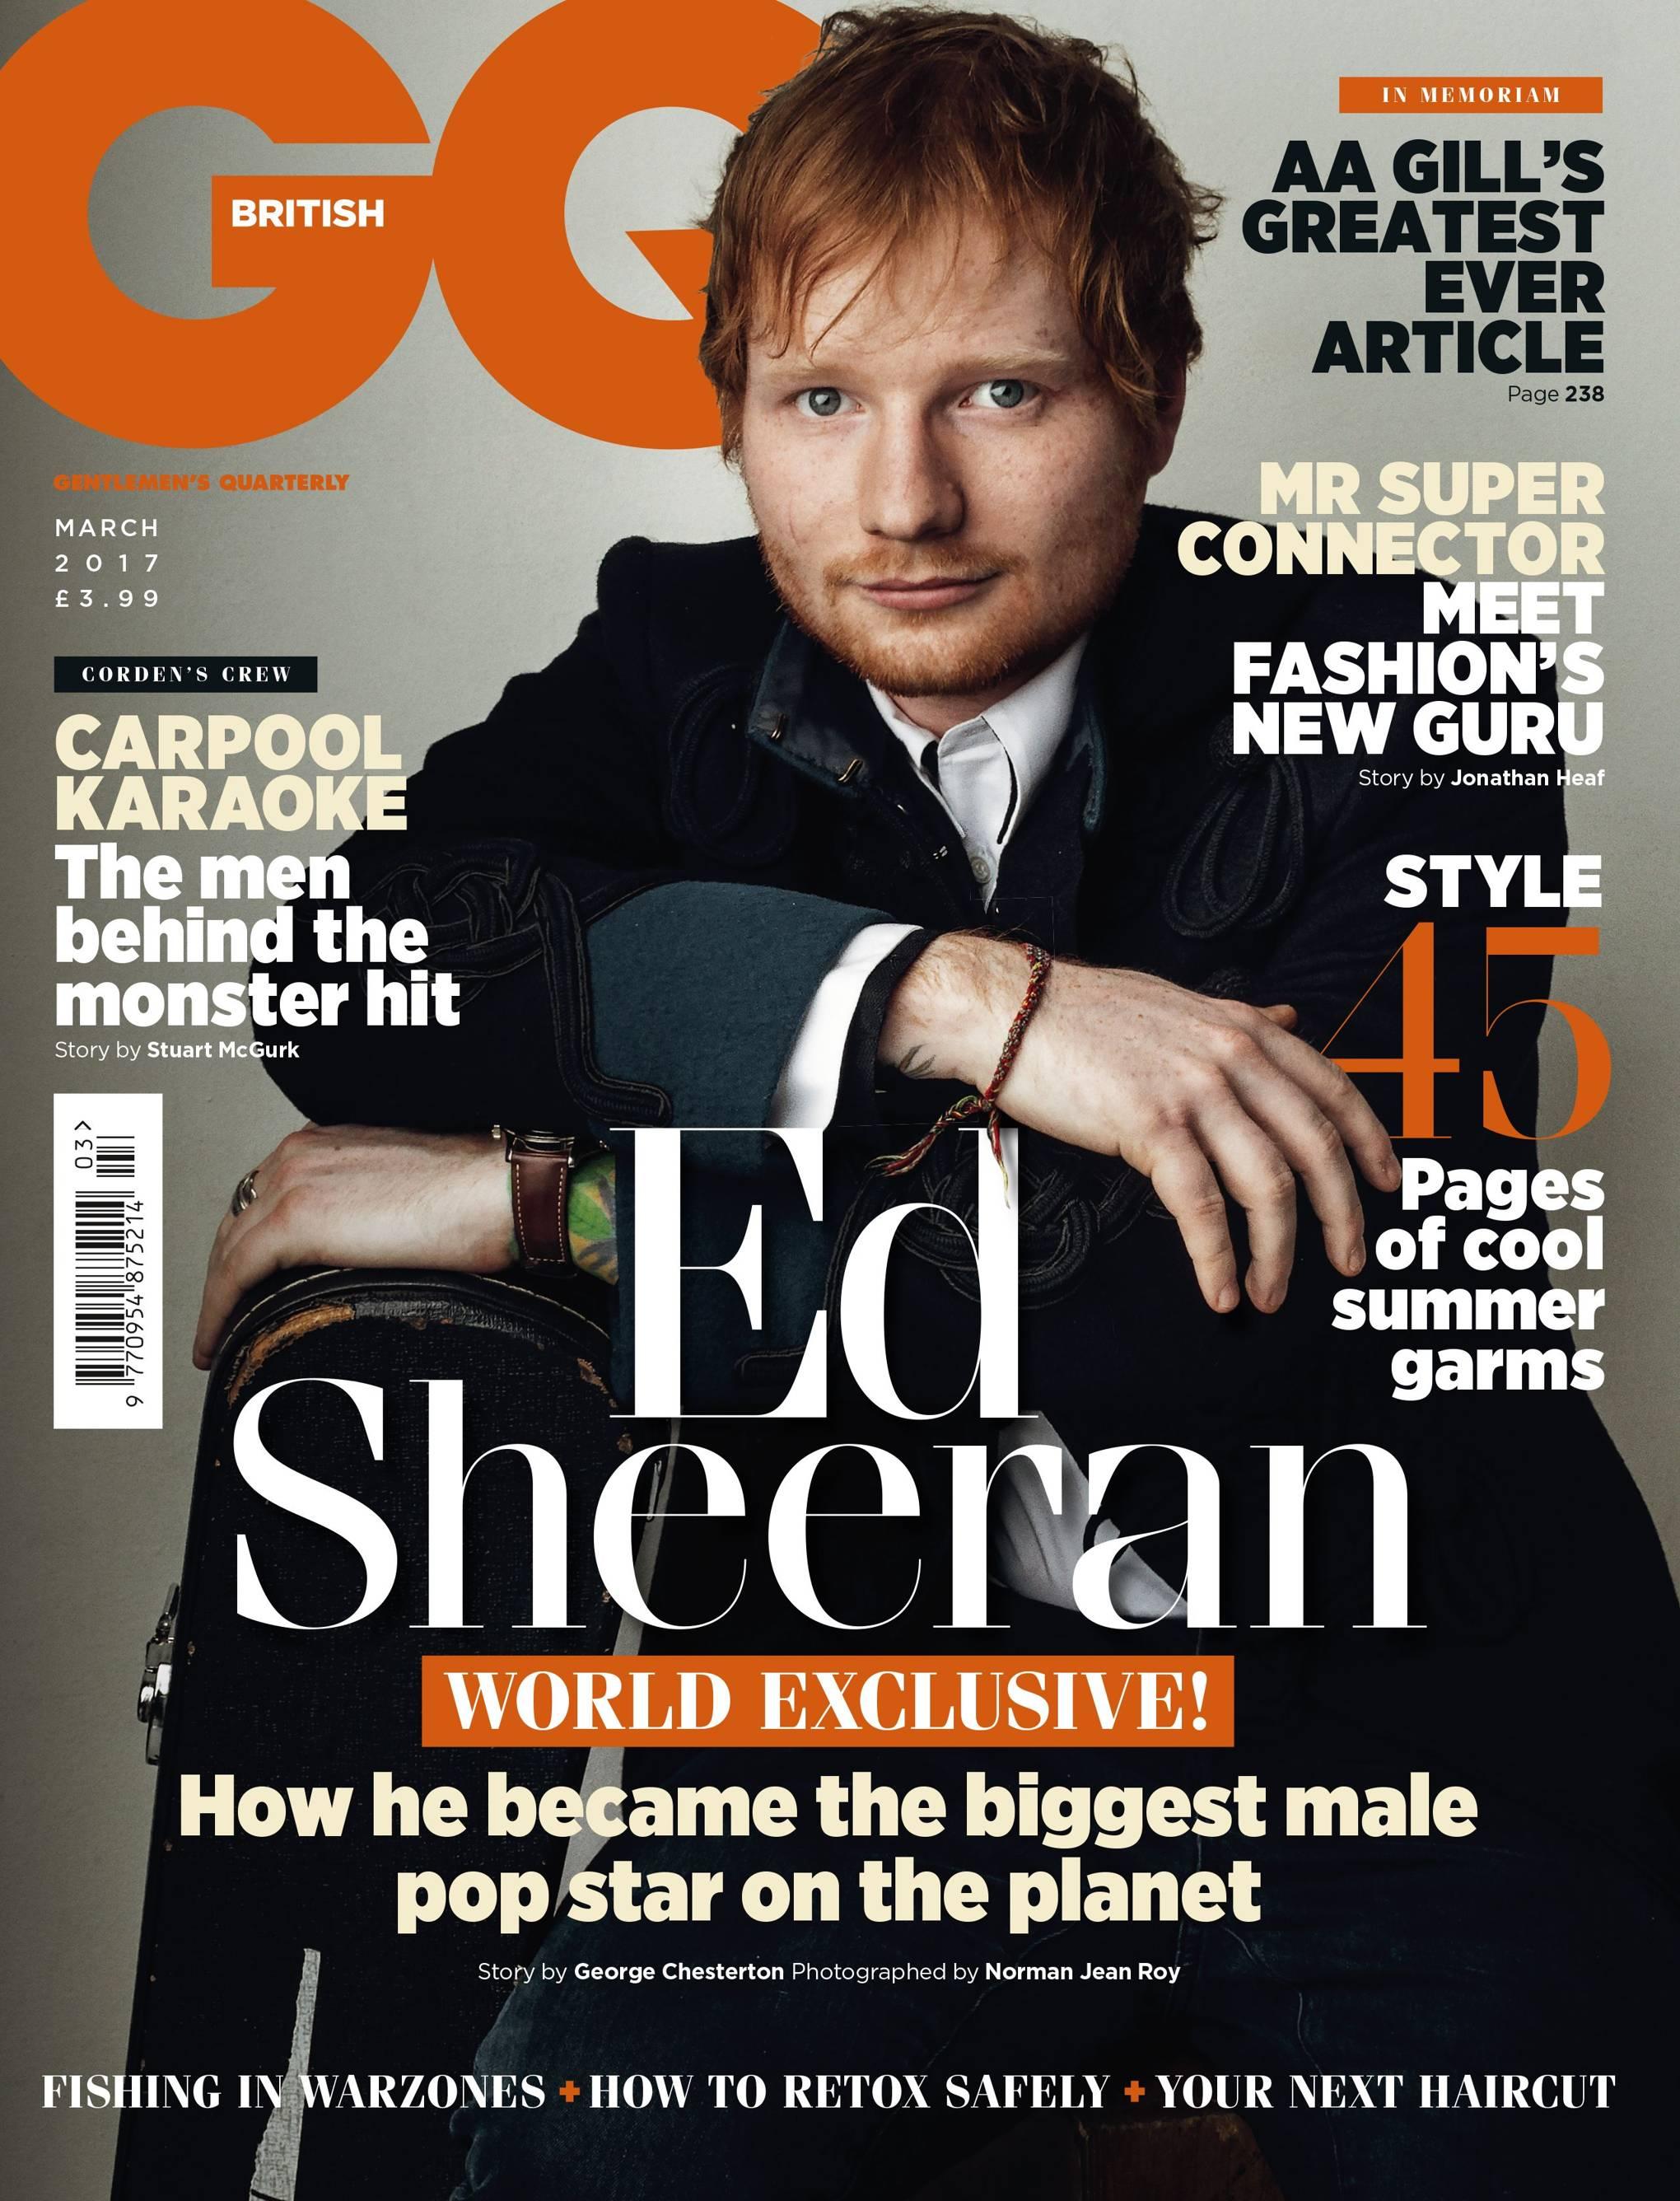 gq magazine march issue highlights british gq